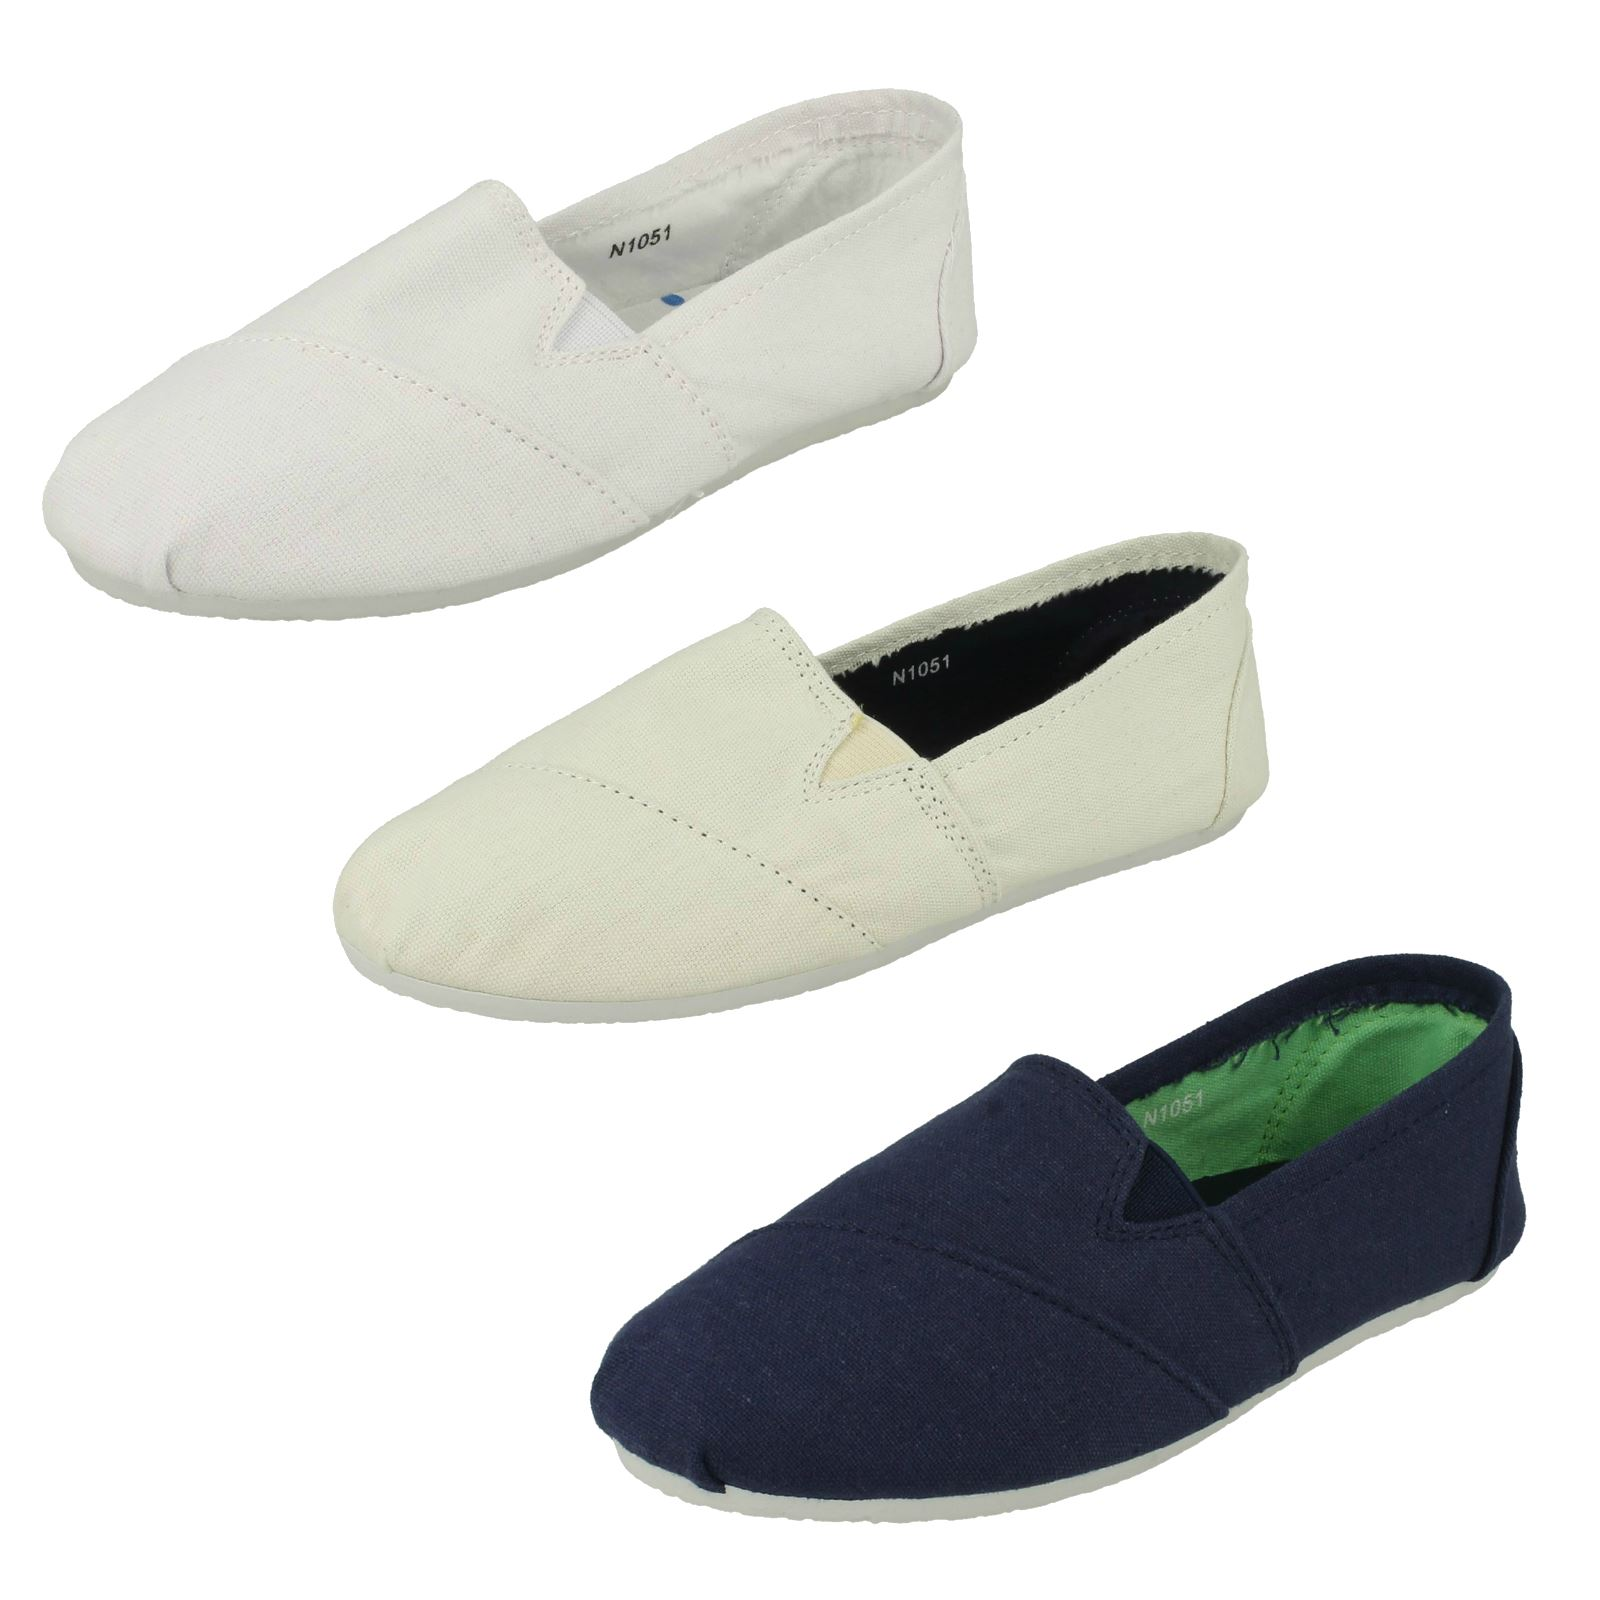 Boys JcDees canvas slip on shoes N1051